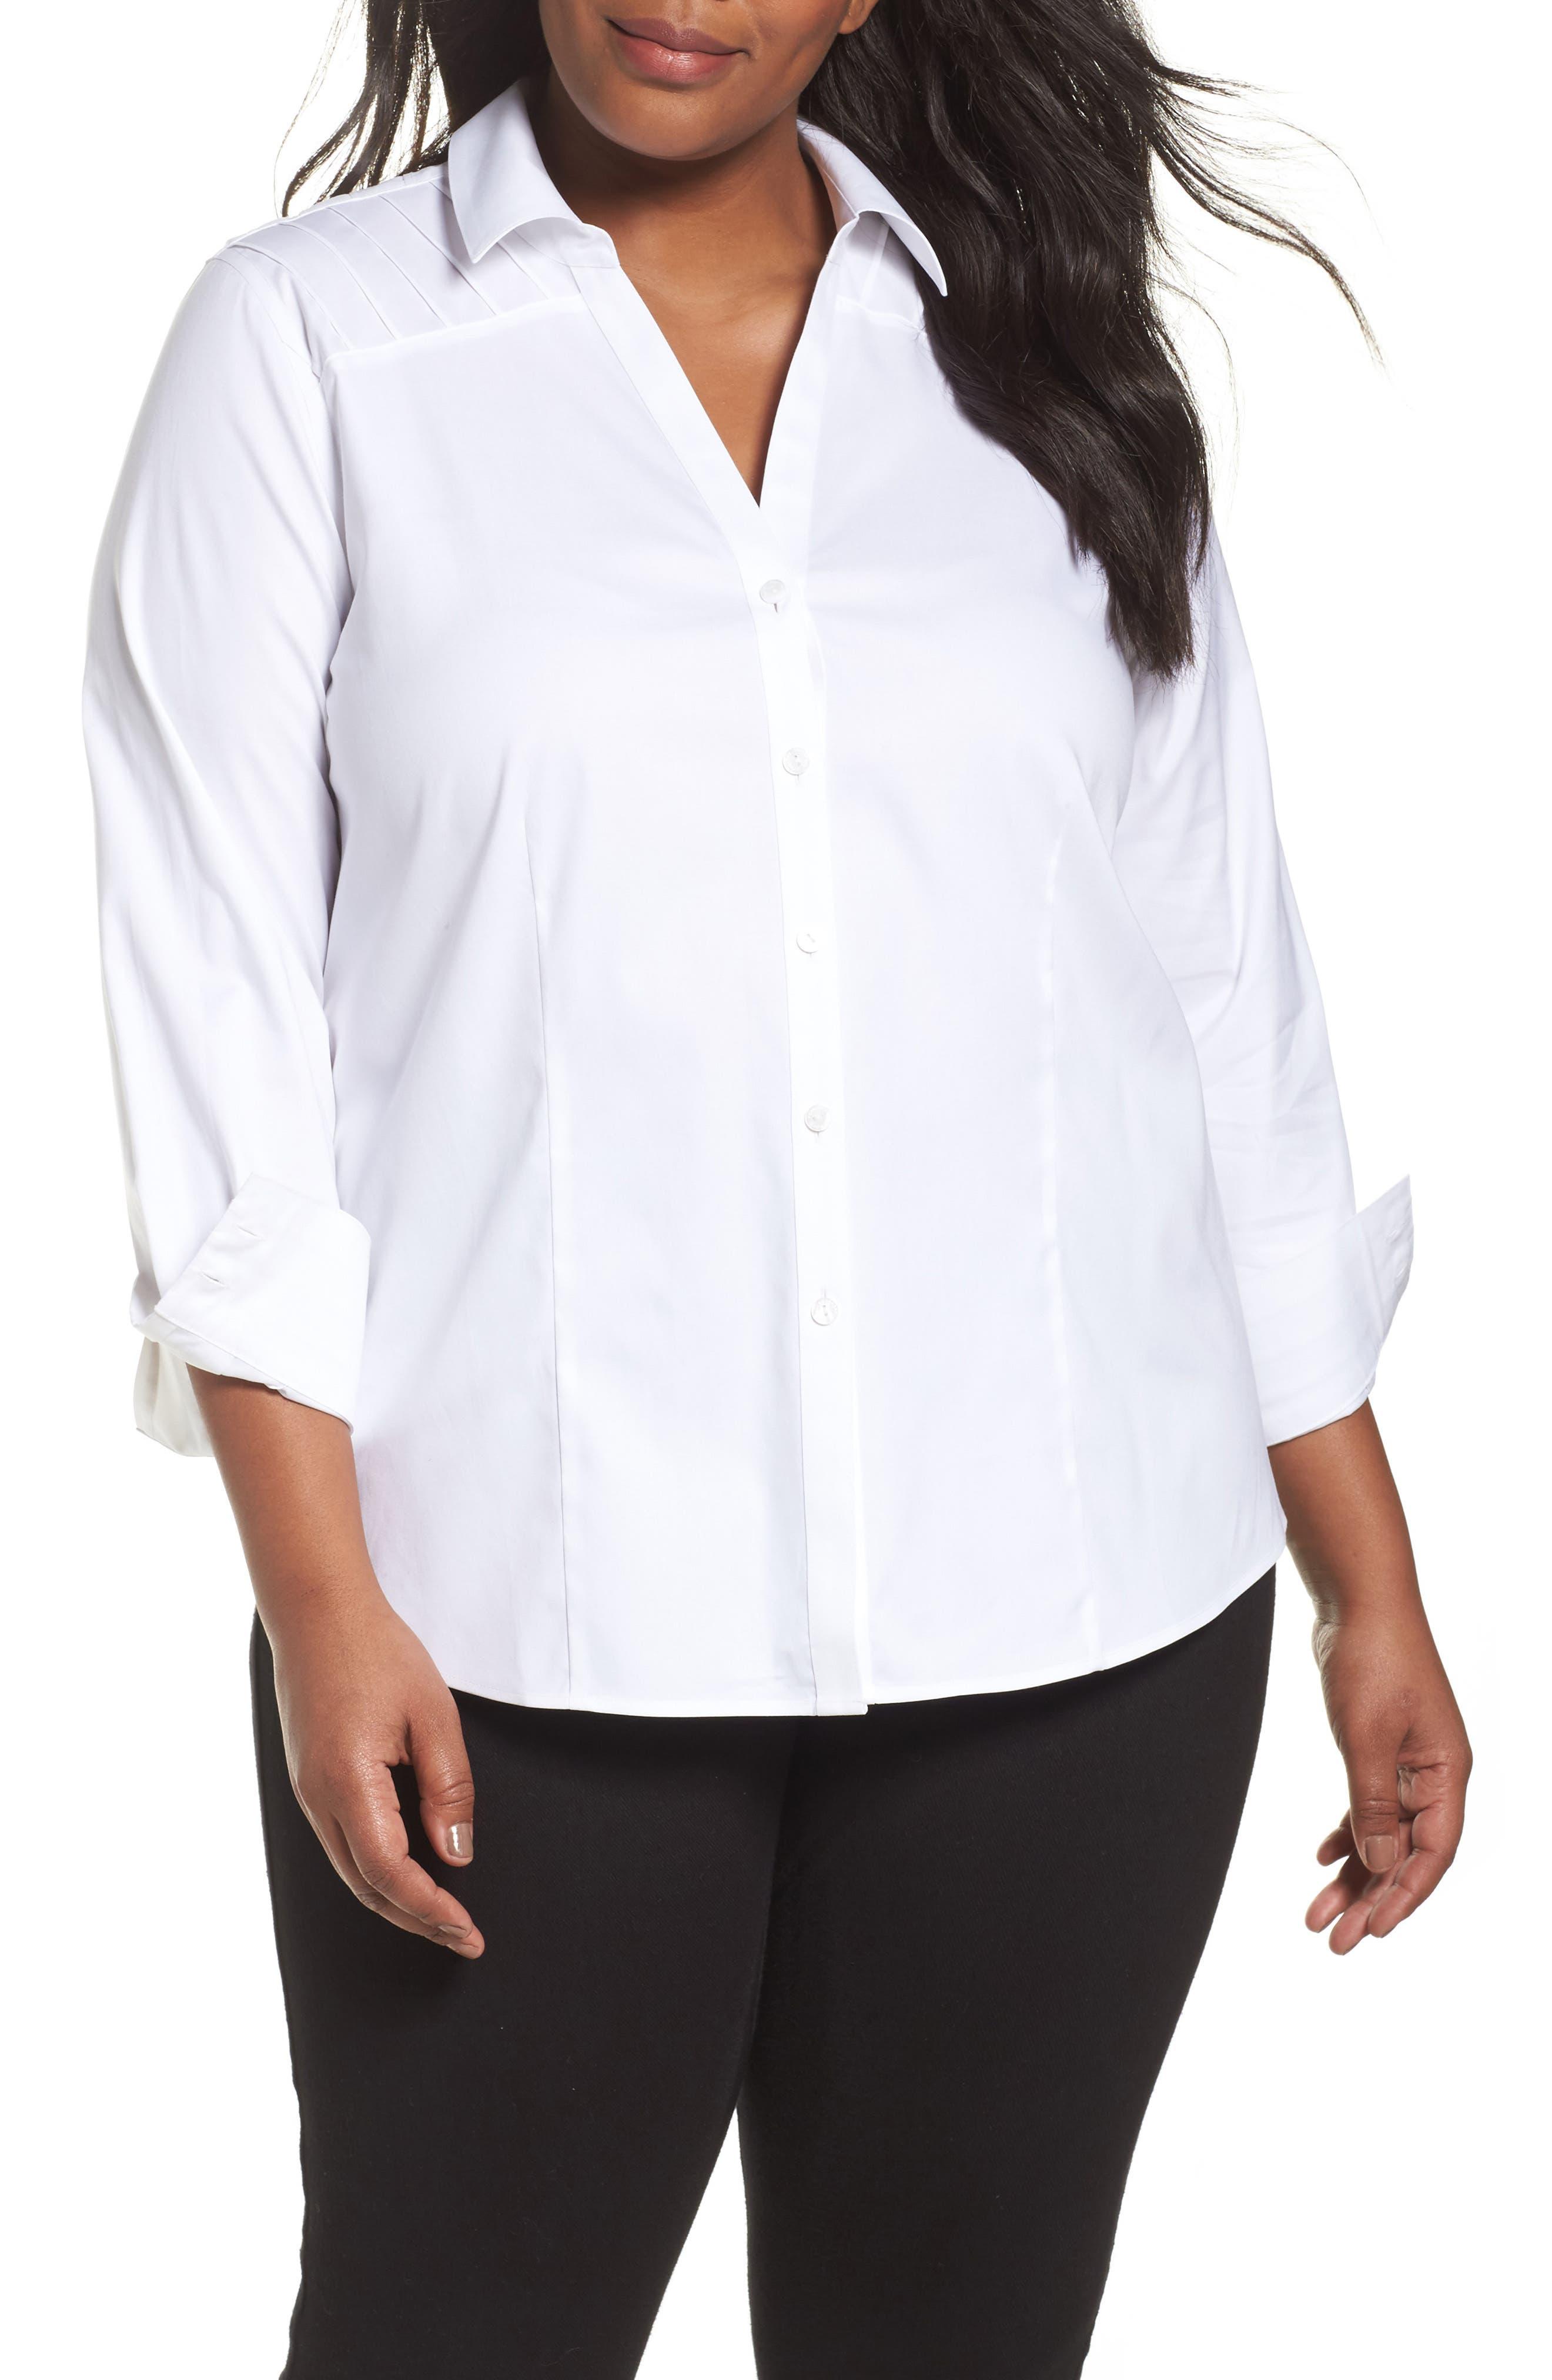 Main Image - Foxcroft Rita Solid Stretch Cotton Top (Plus Size)